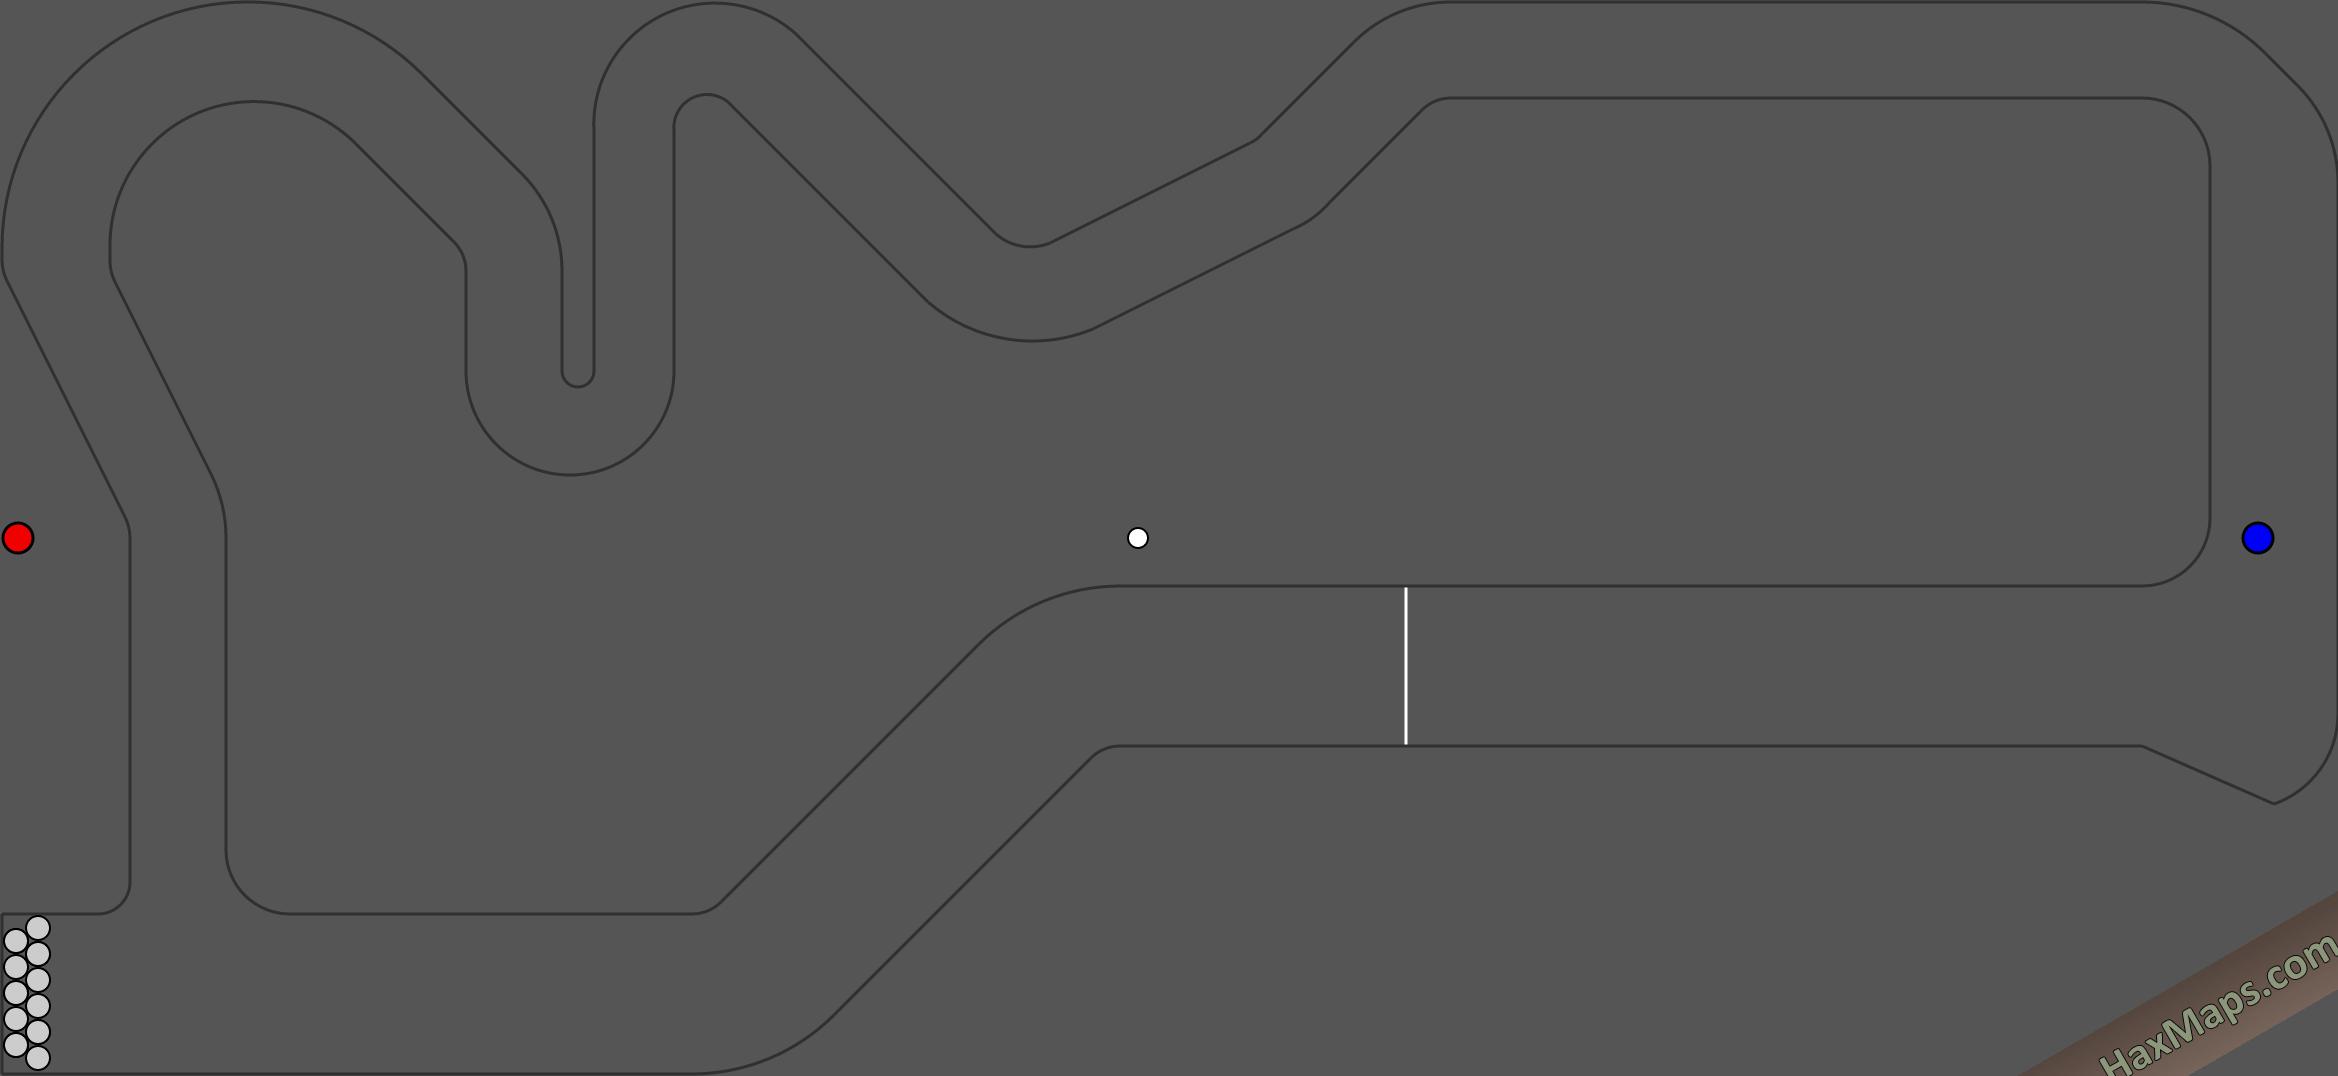 hax ball maps | Car Racing One Lap